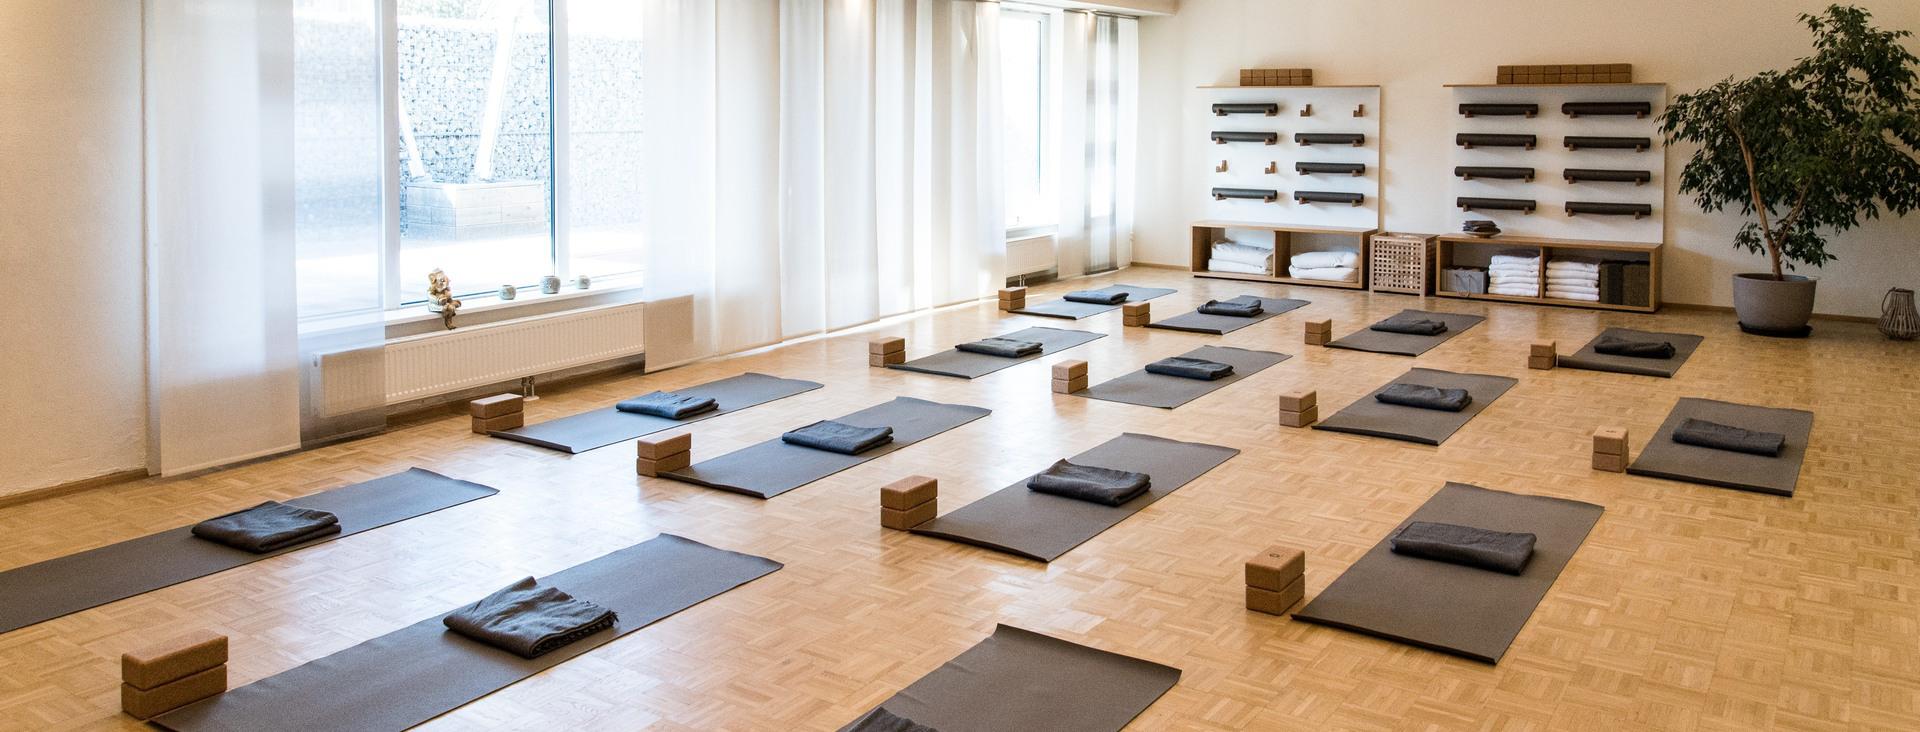 yogannette Studio Raum